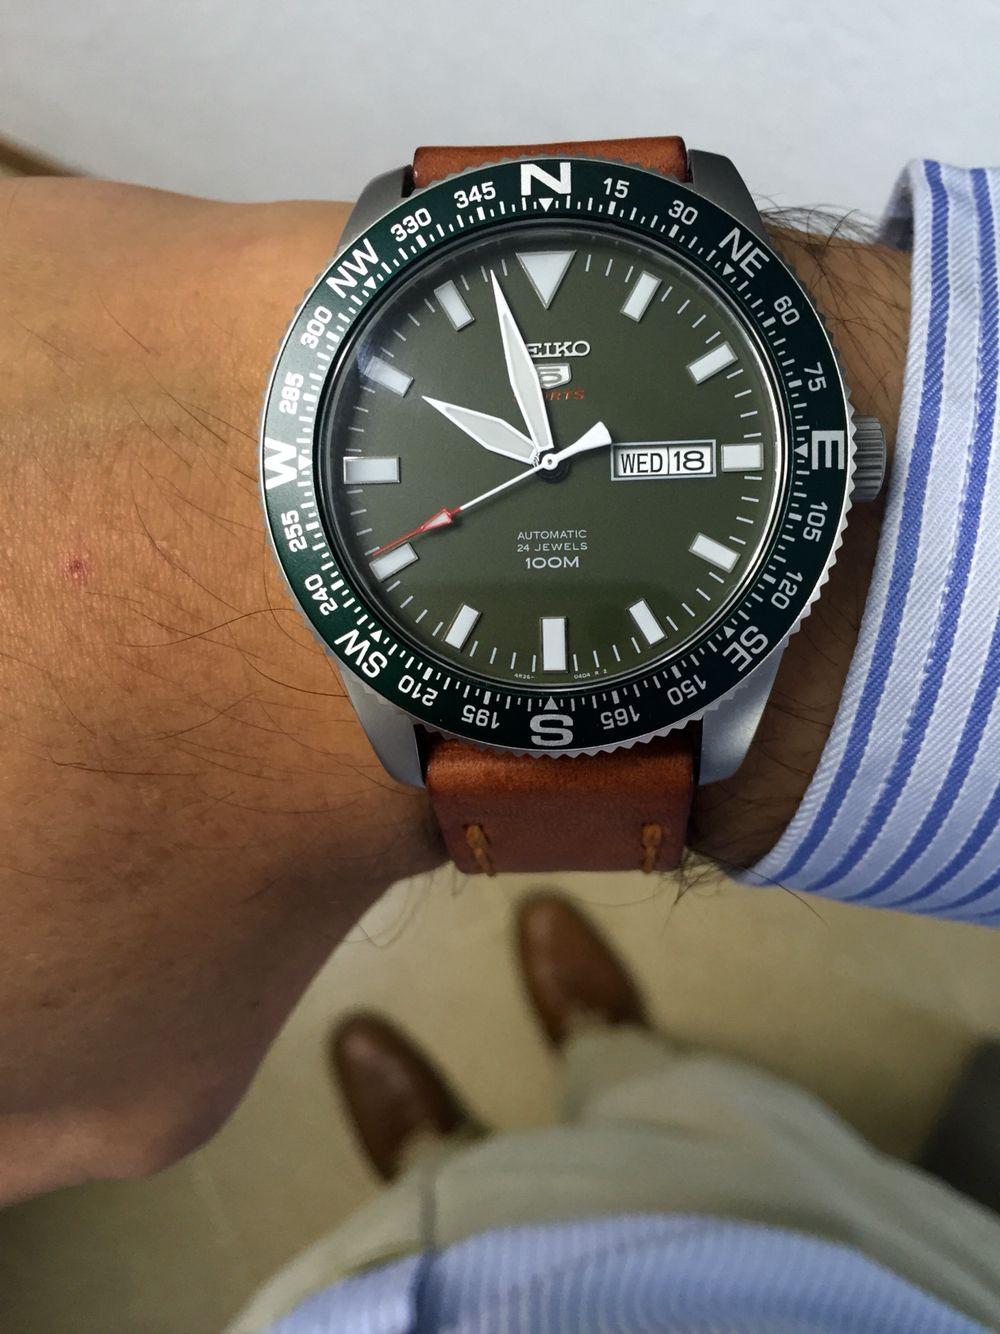 Seiko SRP663K1 Seiko, Watch strap, Breitling watch